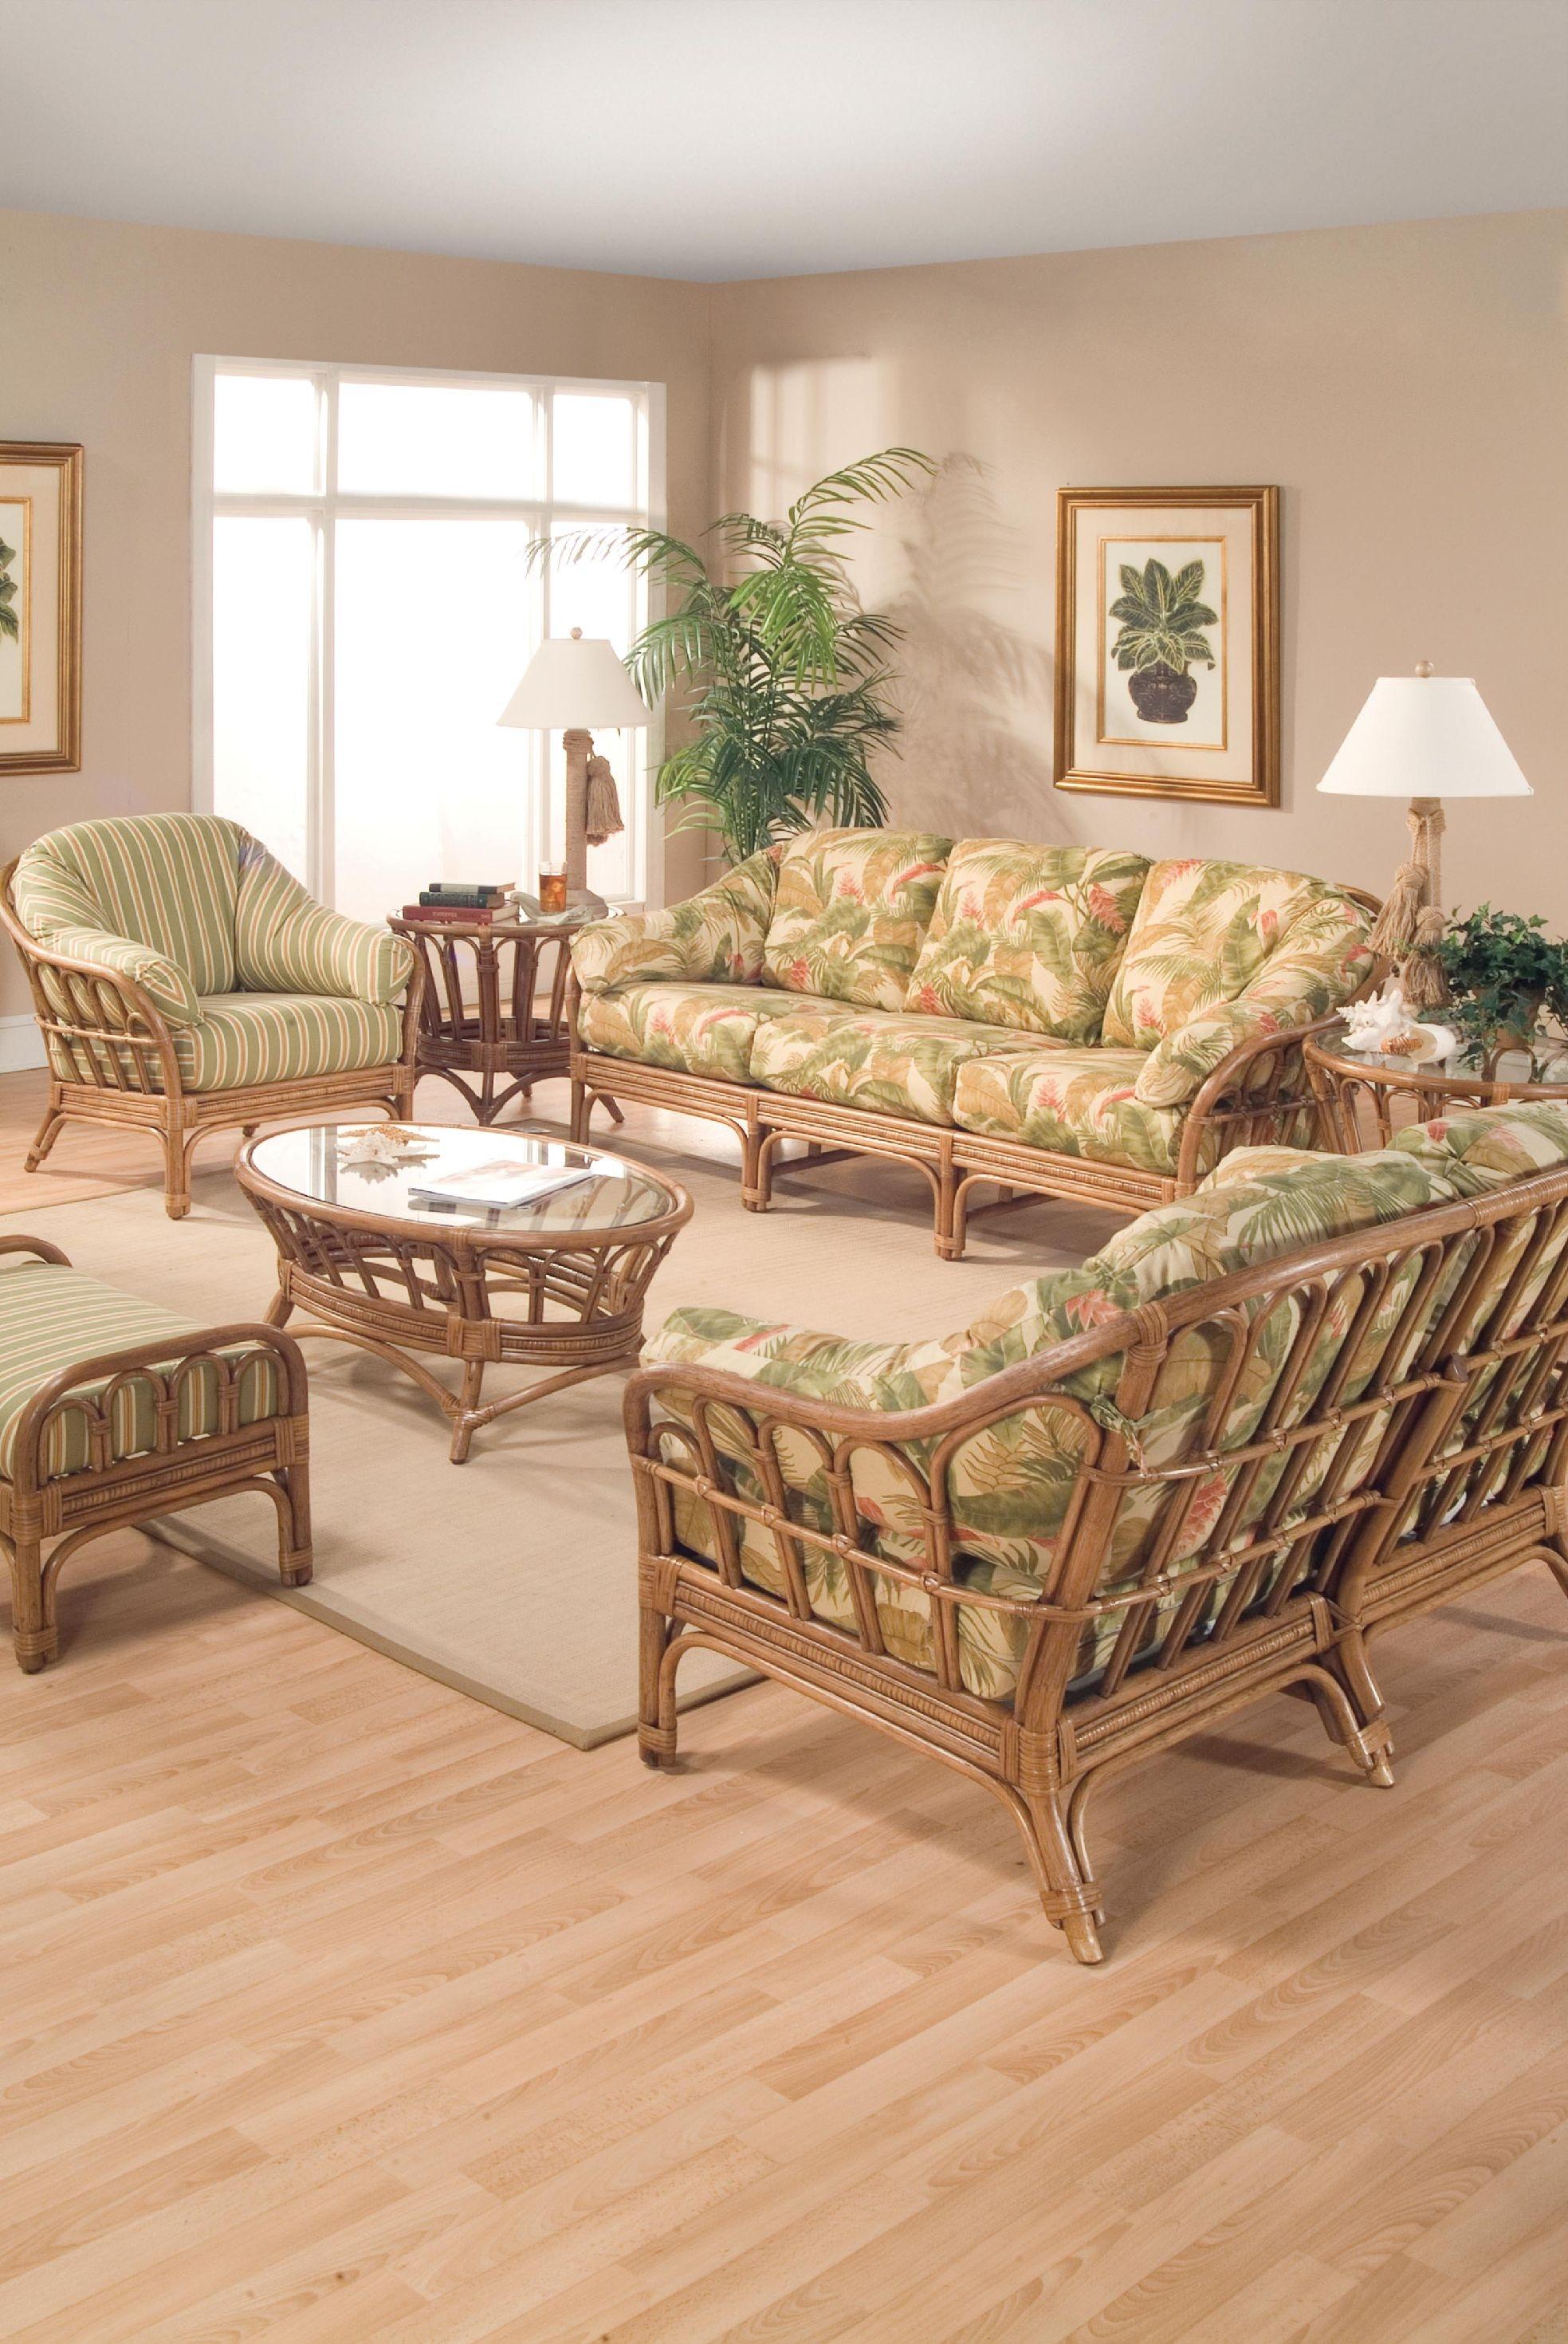 Living Room Sofa 901 011